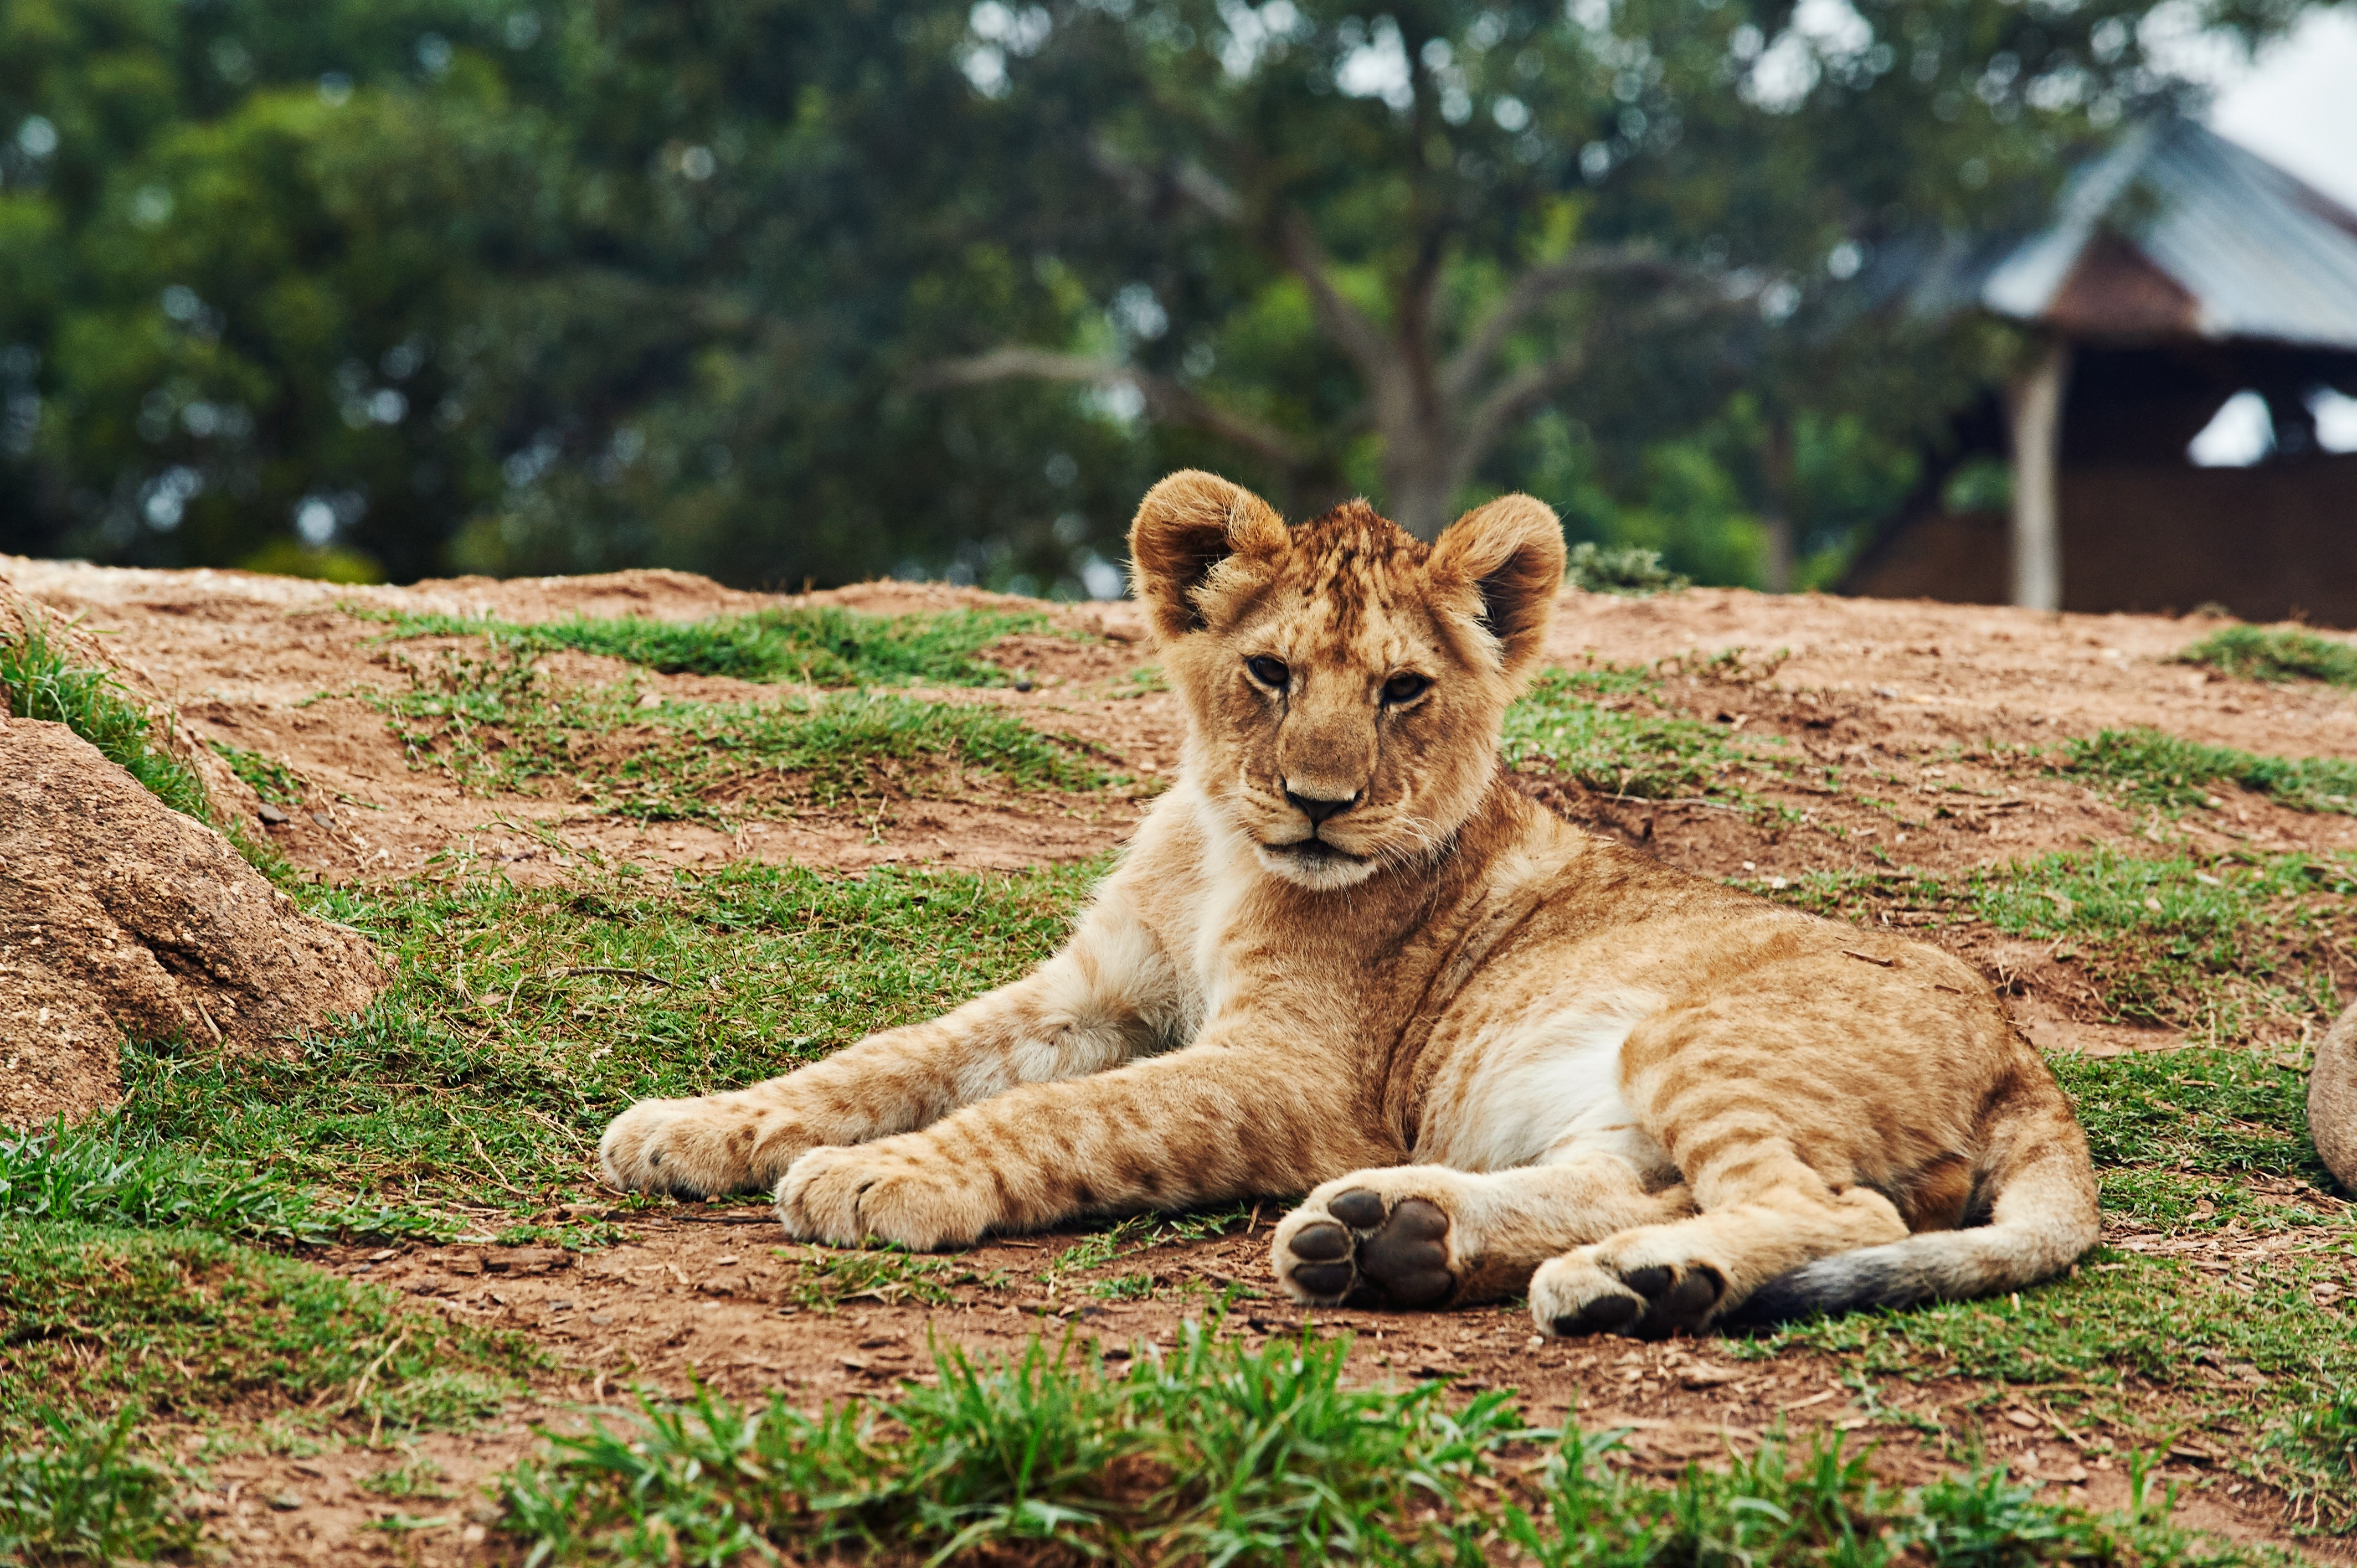 Lion cub lying on ground photo